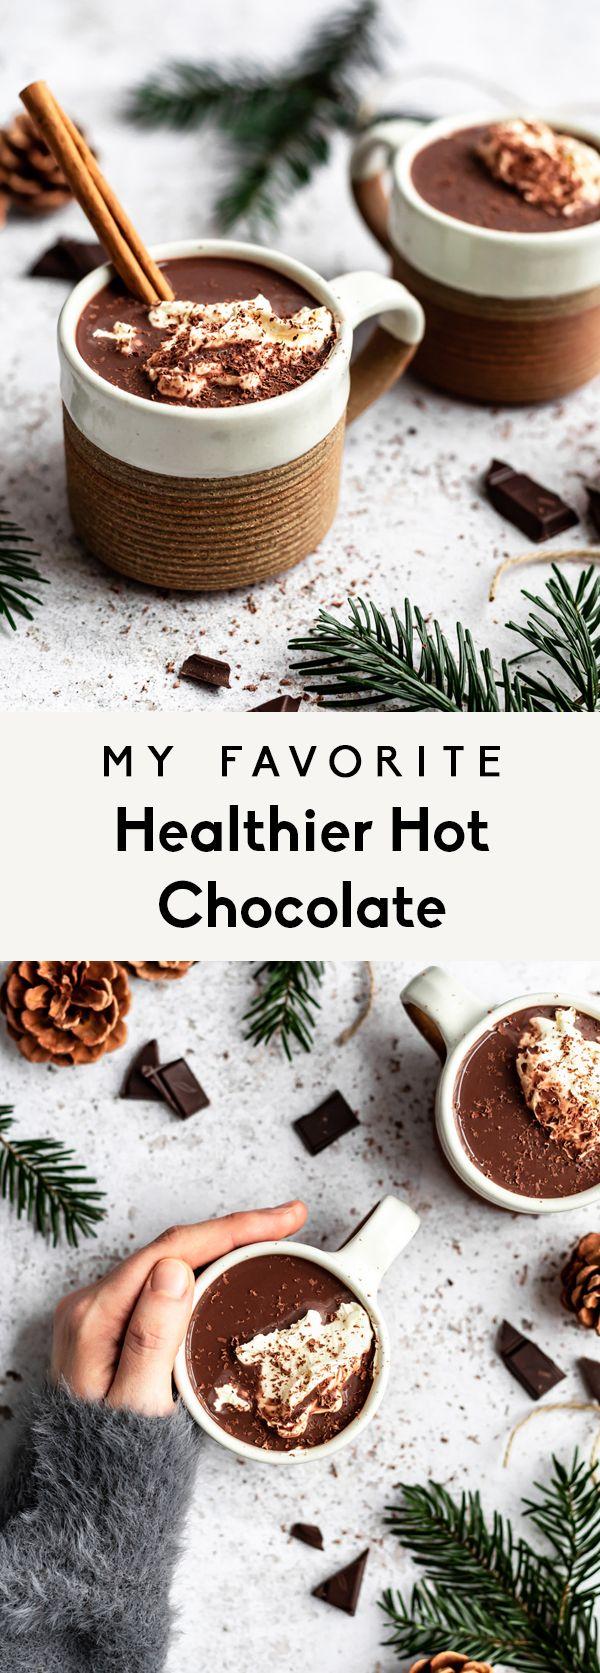 Healthy Hot Chocolate Recipe Vegan Dairy Free Ambitious Kitchen Recipe Healthy Hot Chocolate Healthy Hot Chocolate Recipe Hot Chocolate Recipe Vegan